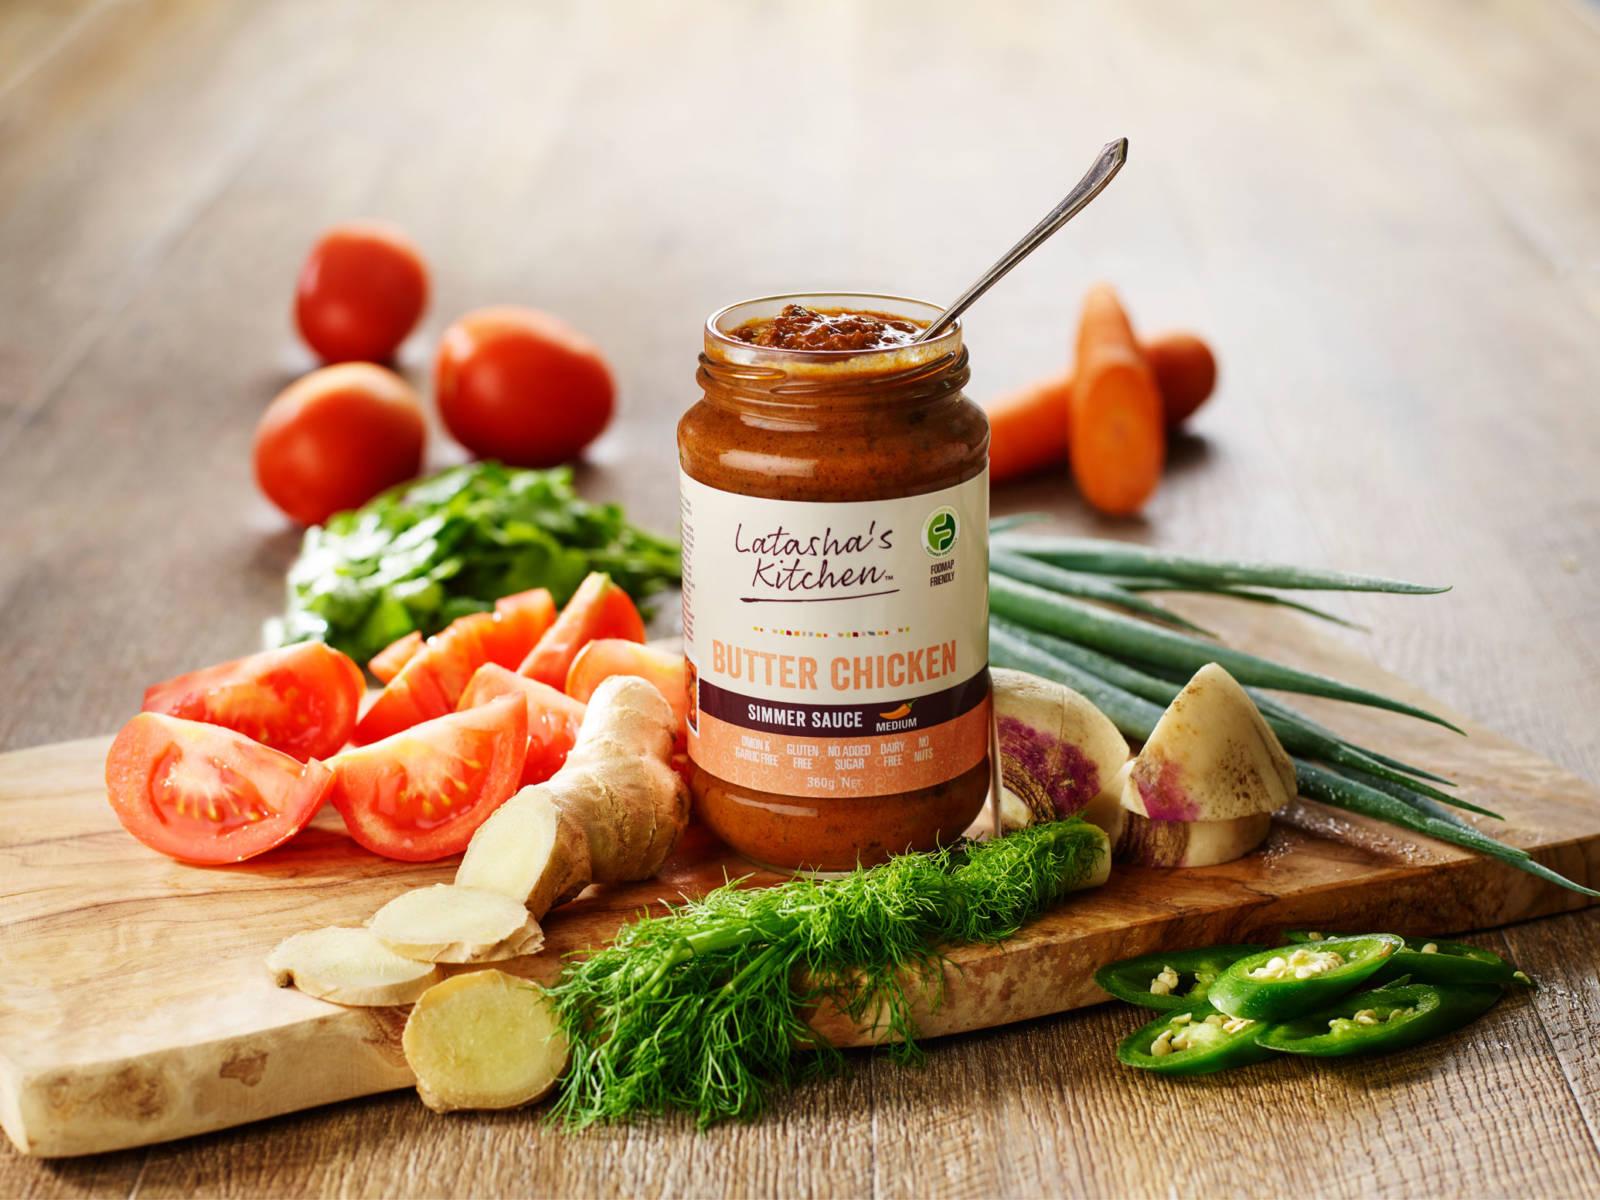 Low FODMAP Simmer Sauces - Butter Chicken by Latasha's Kitchen